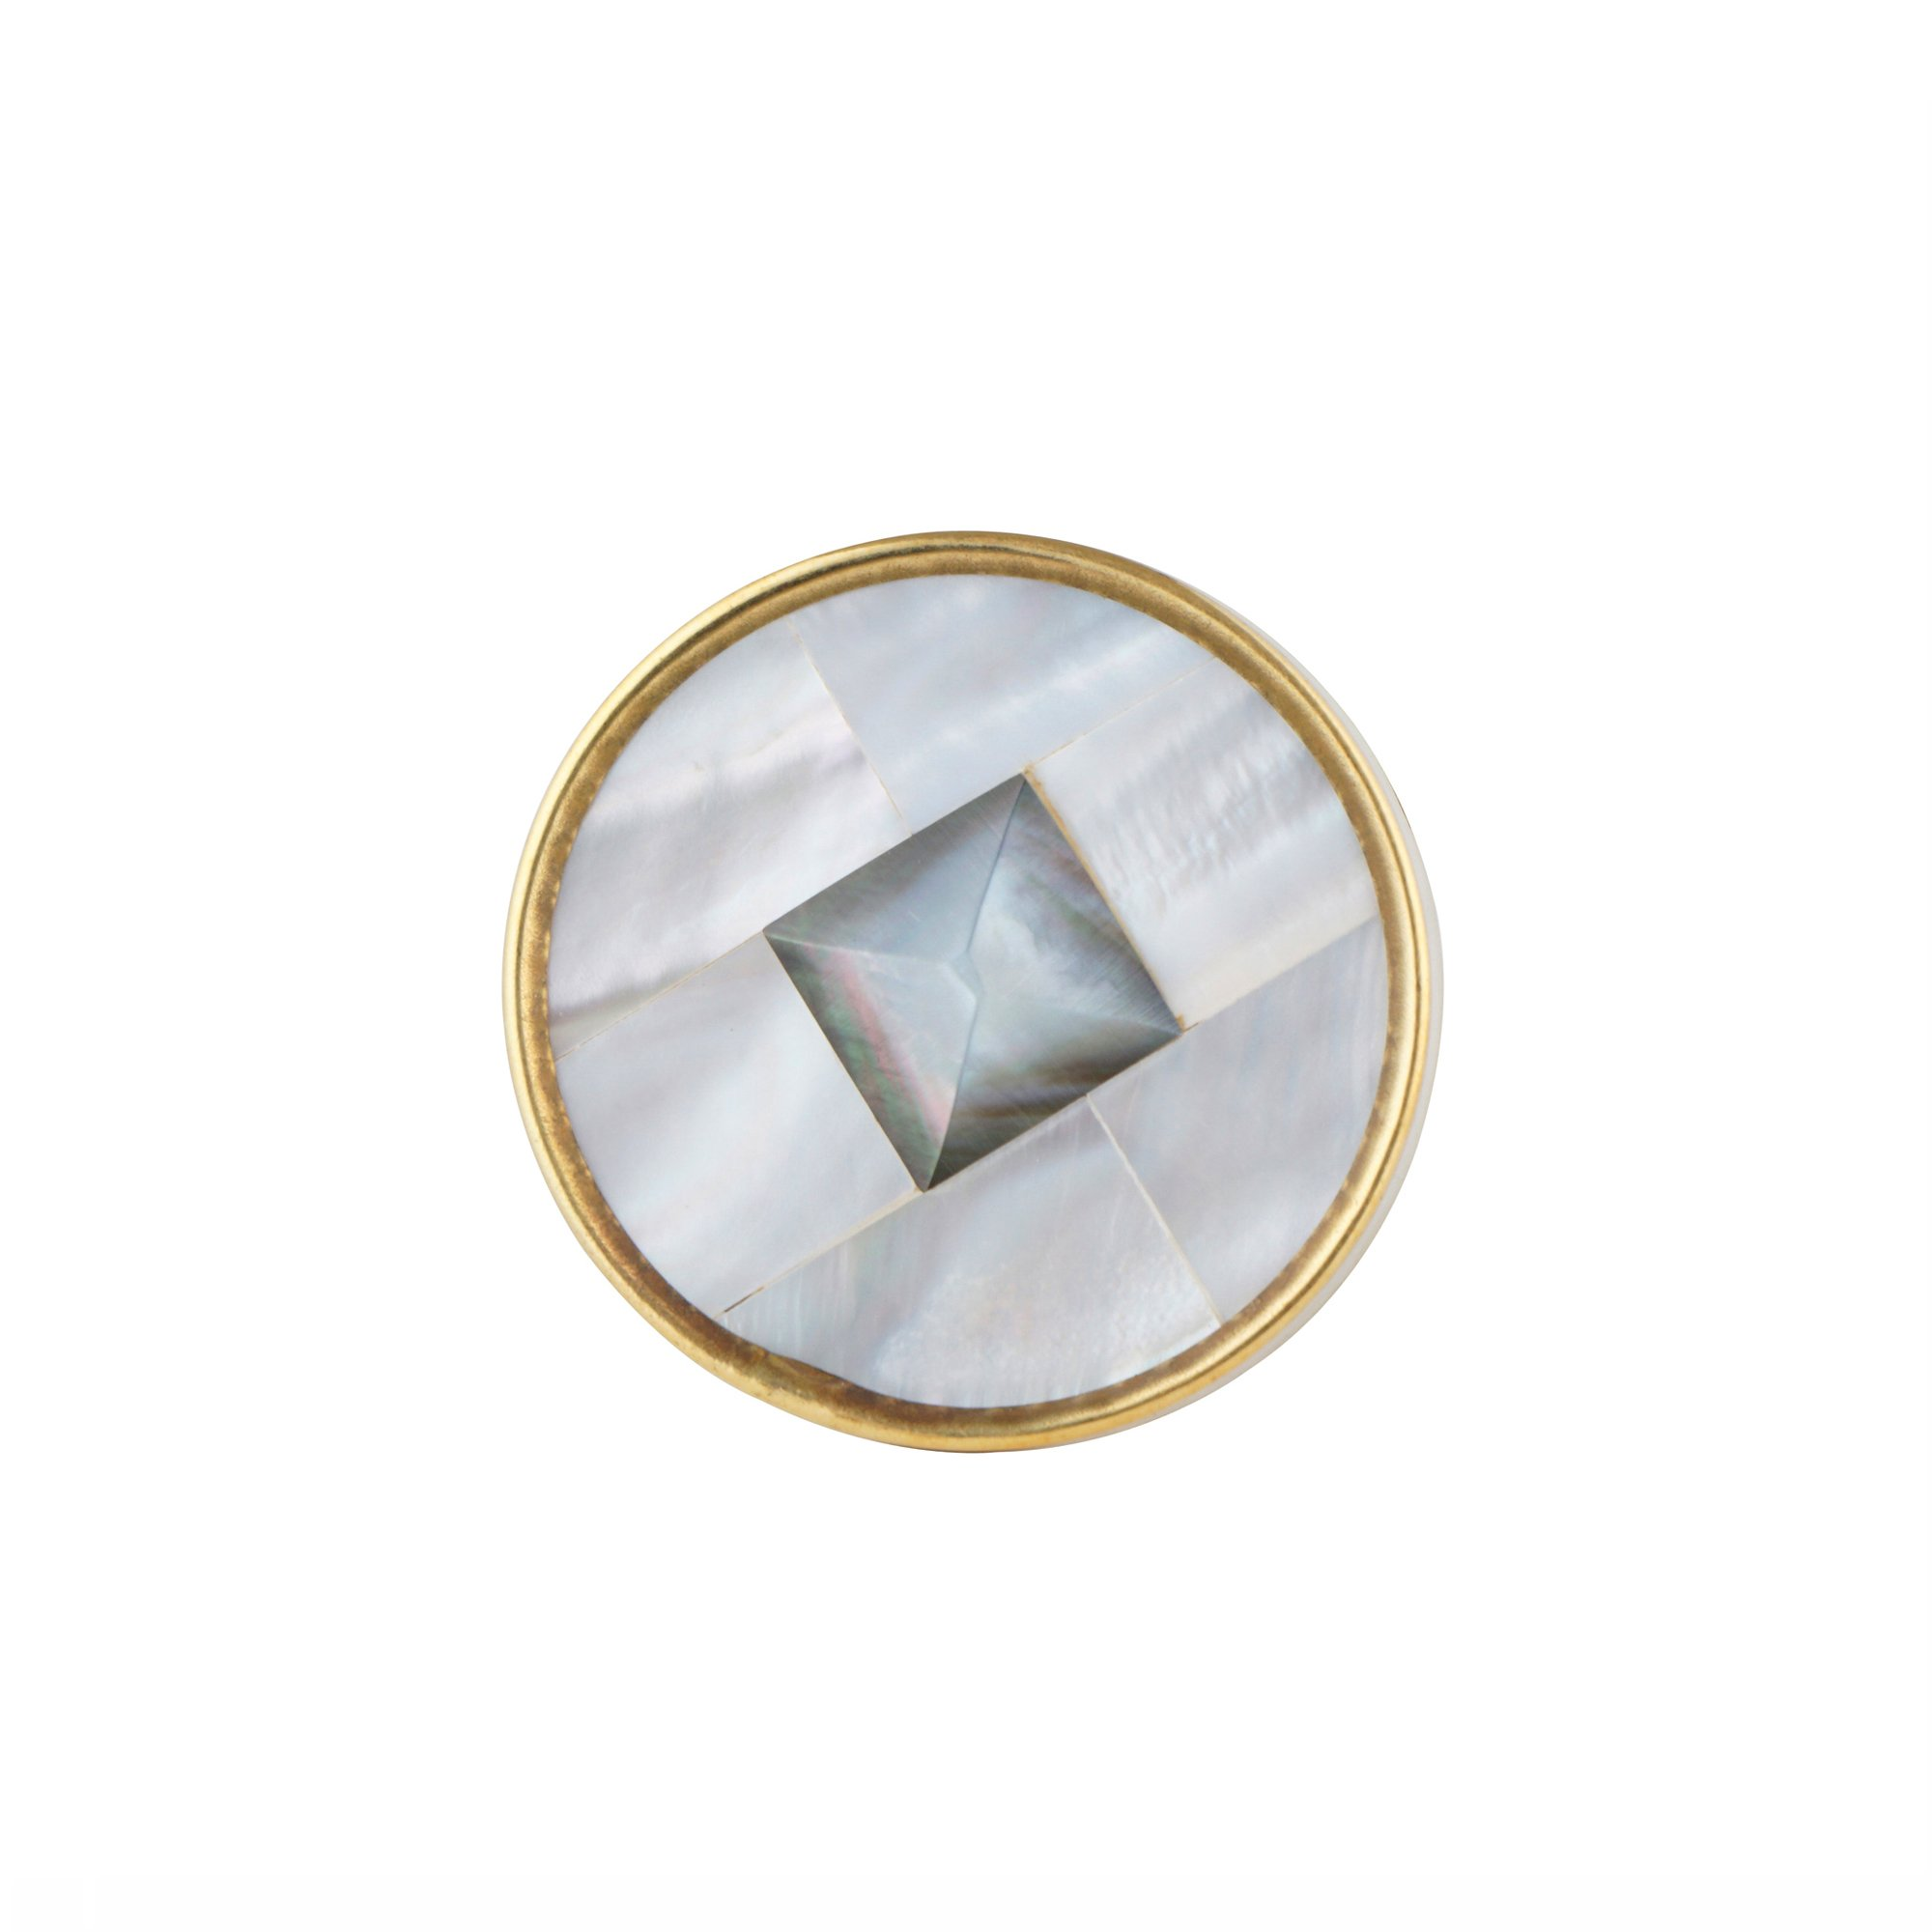 Merveilleux Cheap Cabinet Decorative Hardware, Find Cabinet Decorative ...